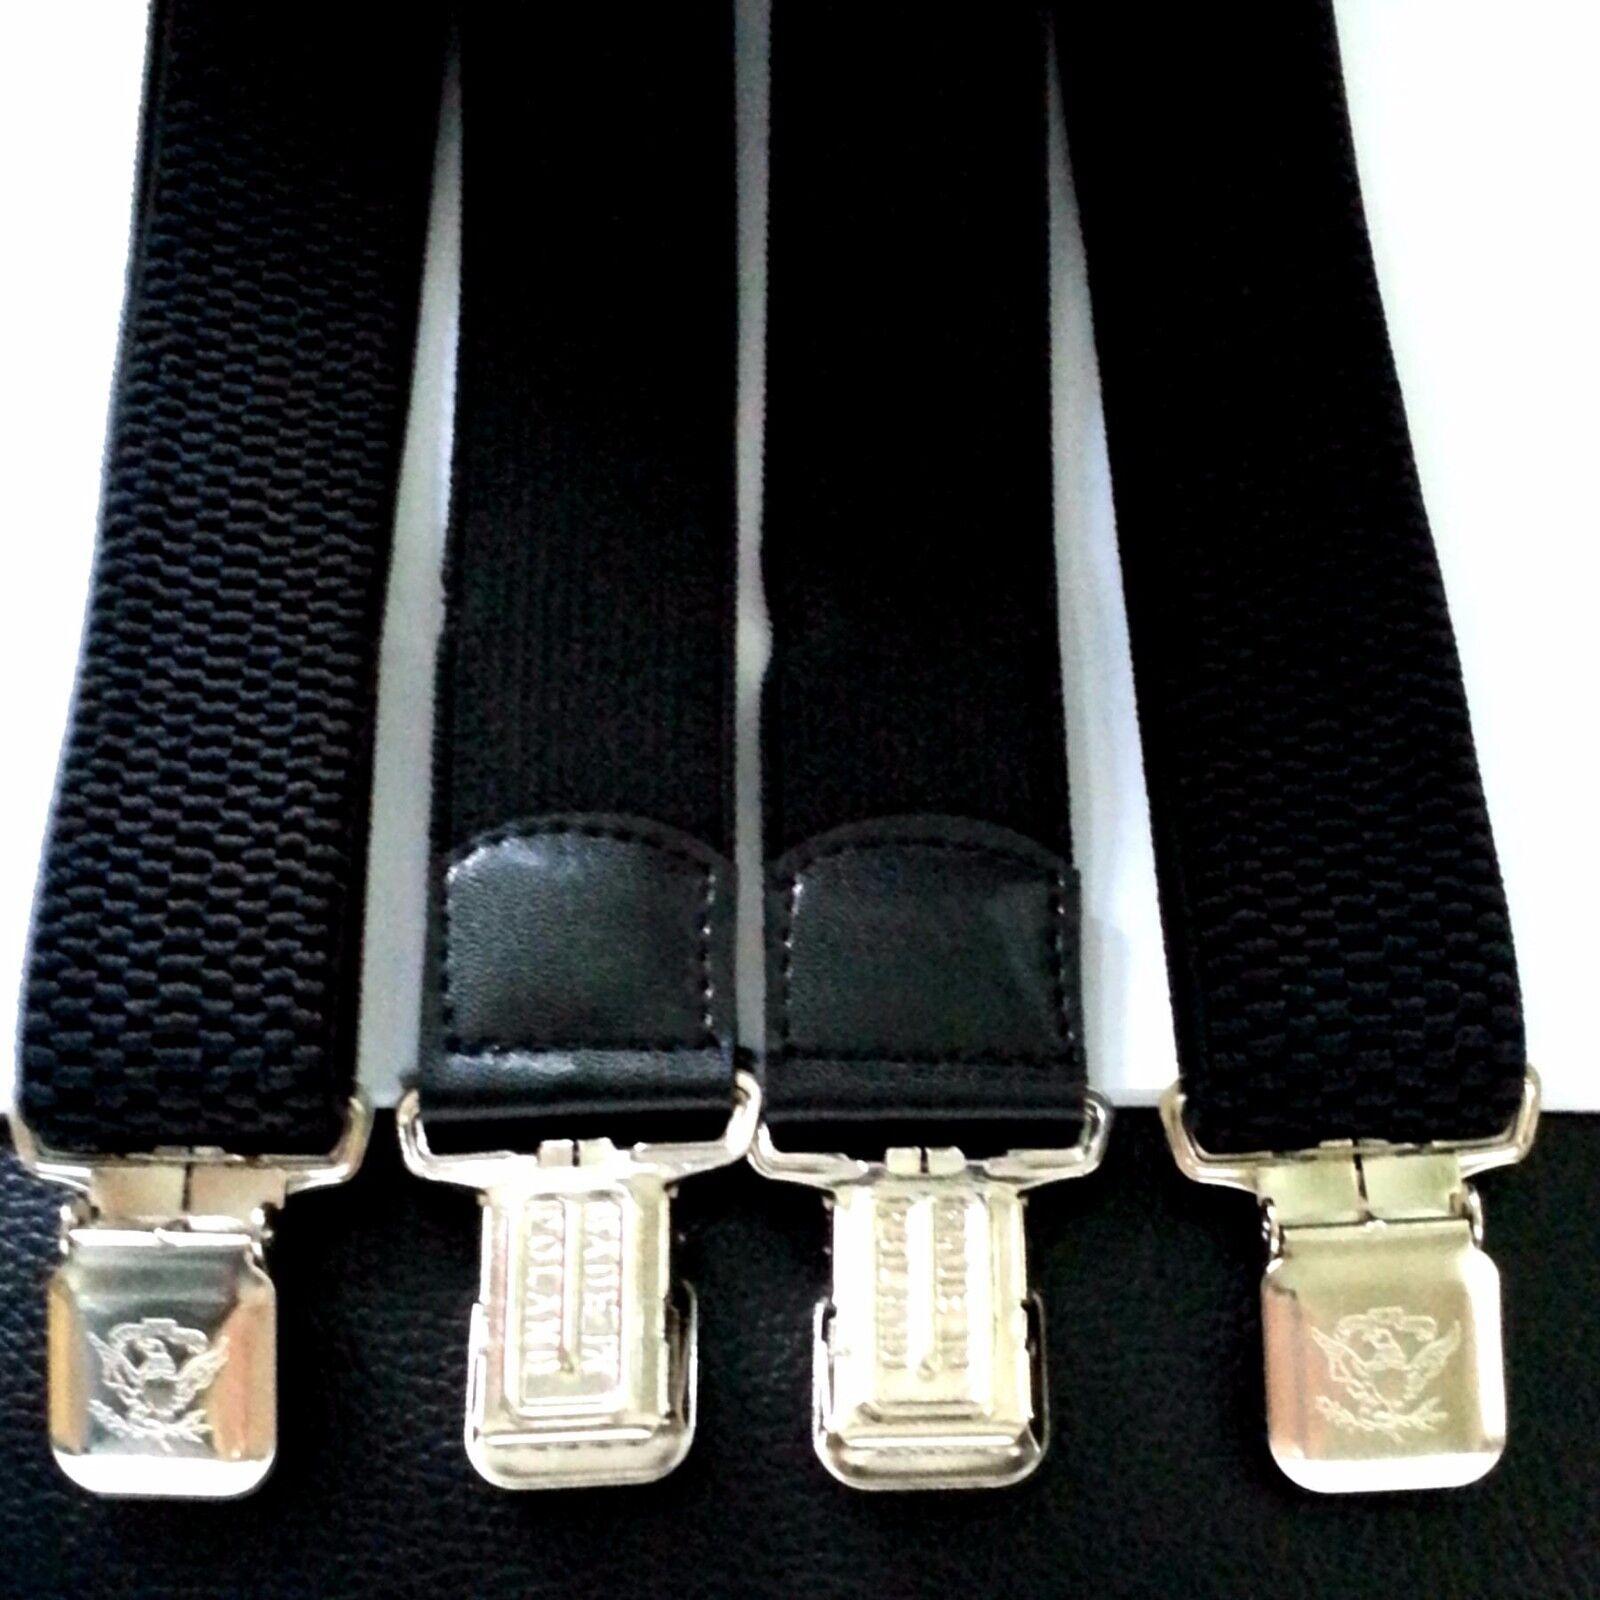 Damen Herren Hosenträger Hose Gürtel Schwarz 4 starke Clips Träger H-Form breit